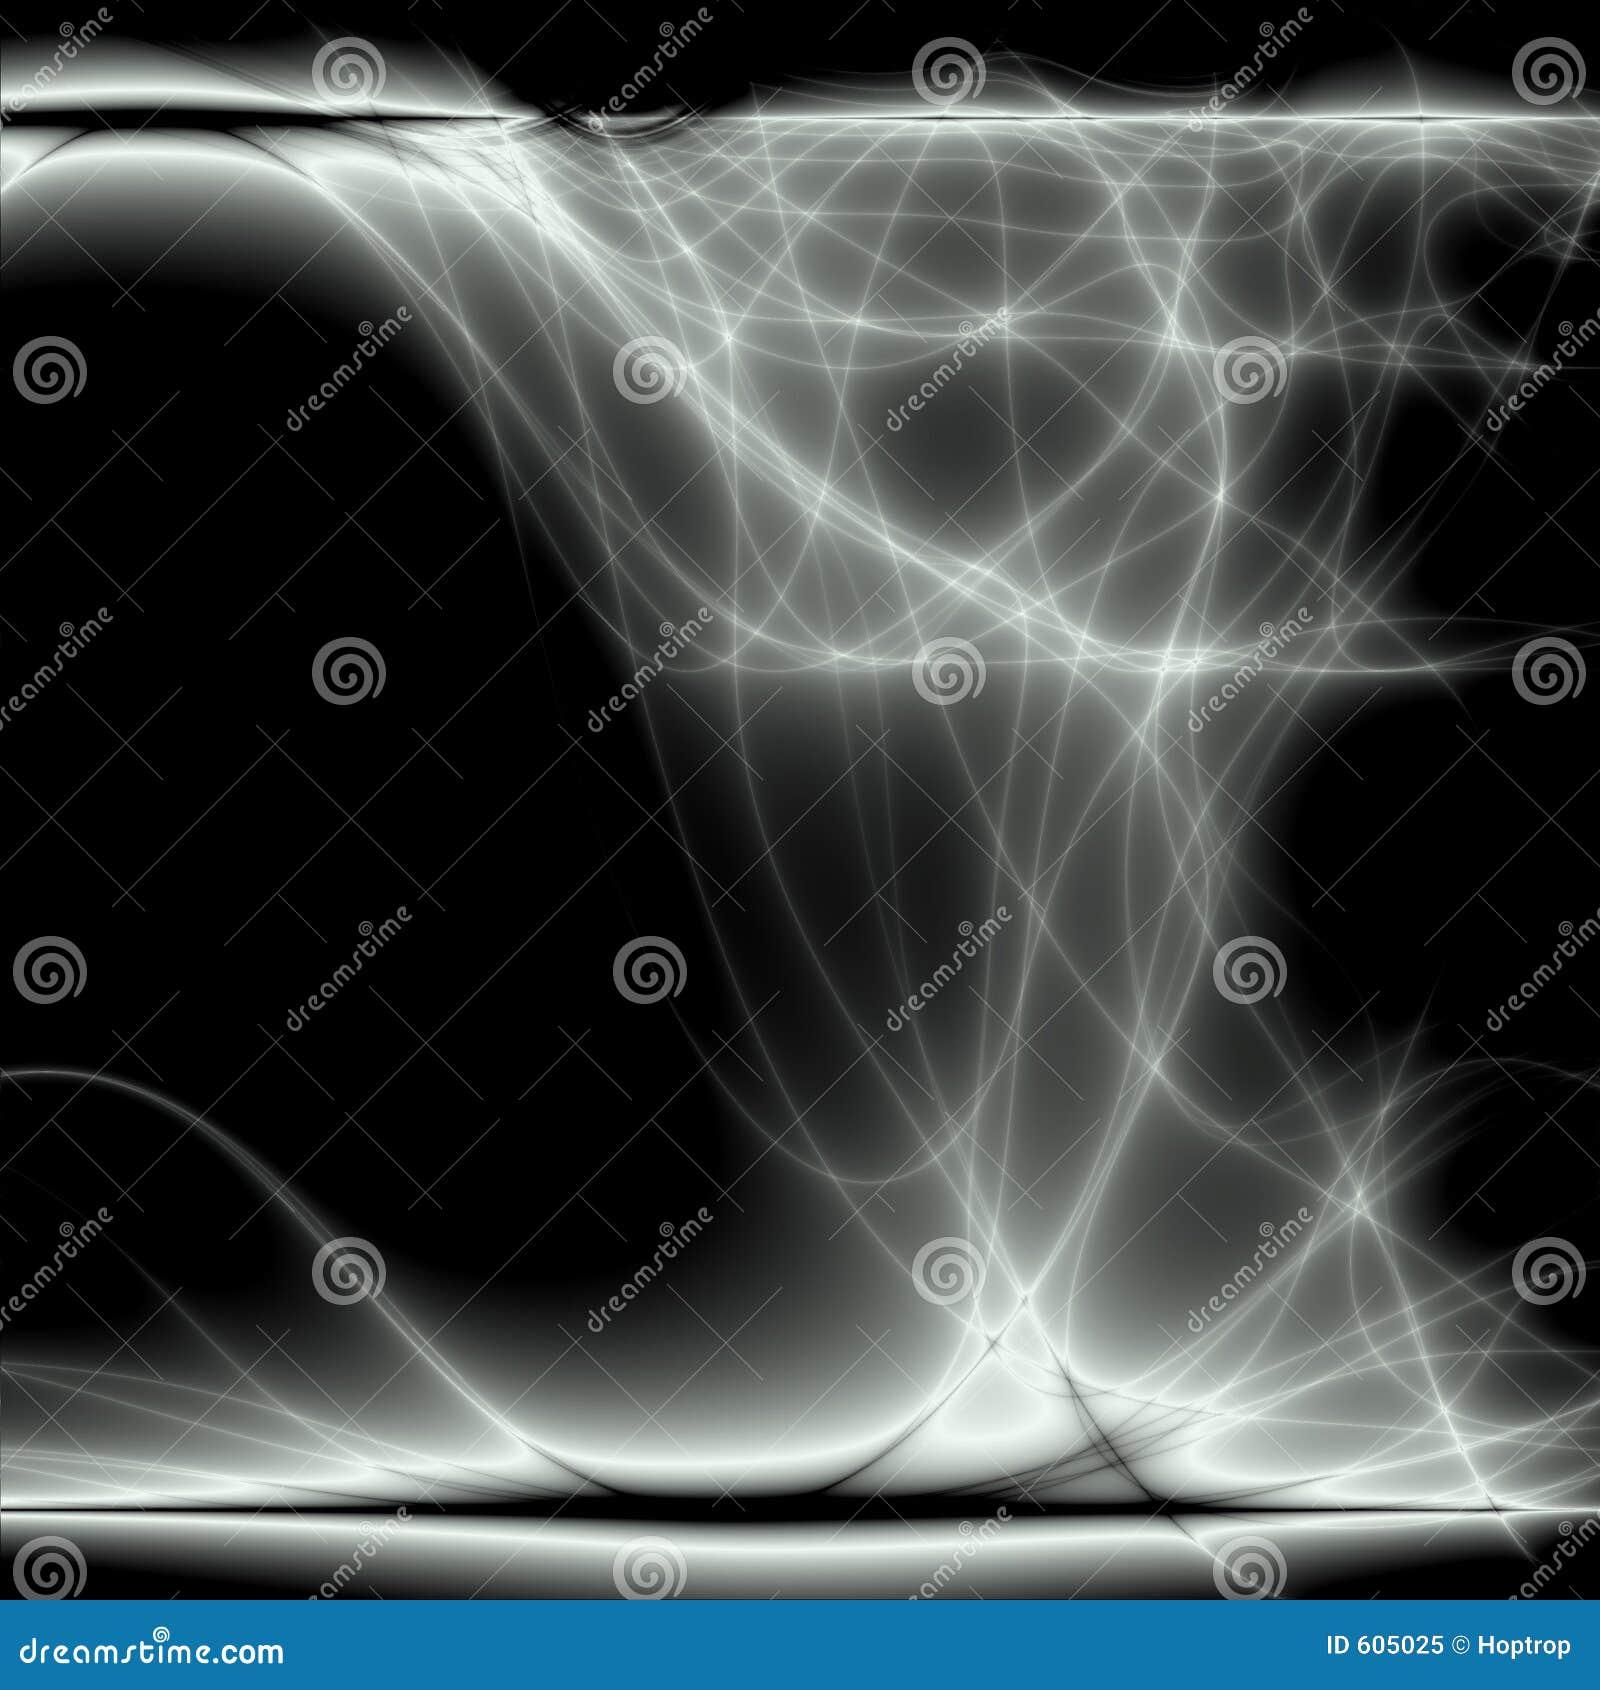 Glow Grid